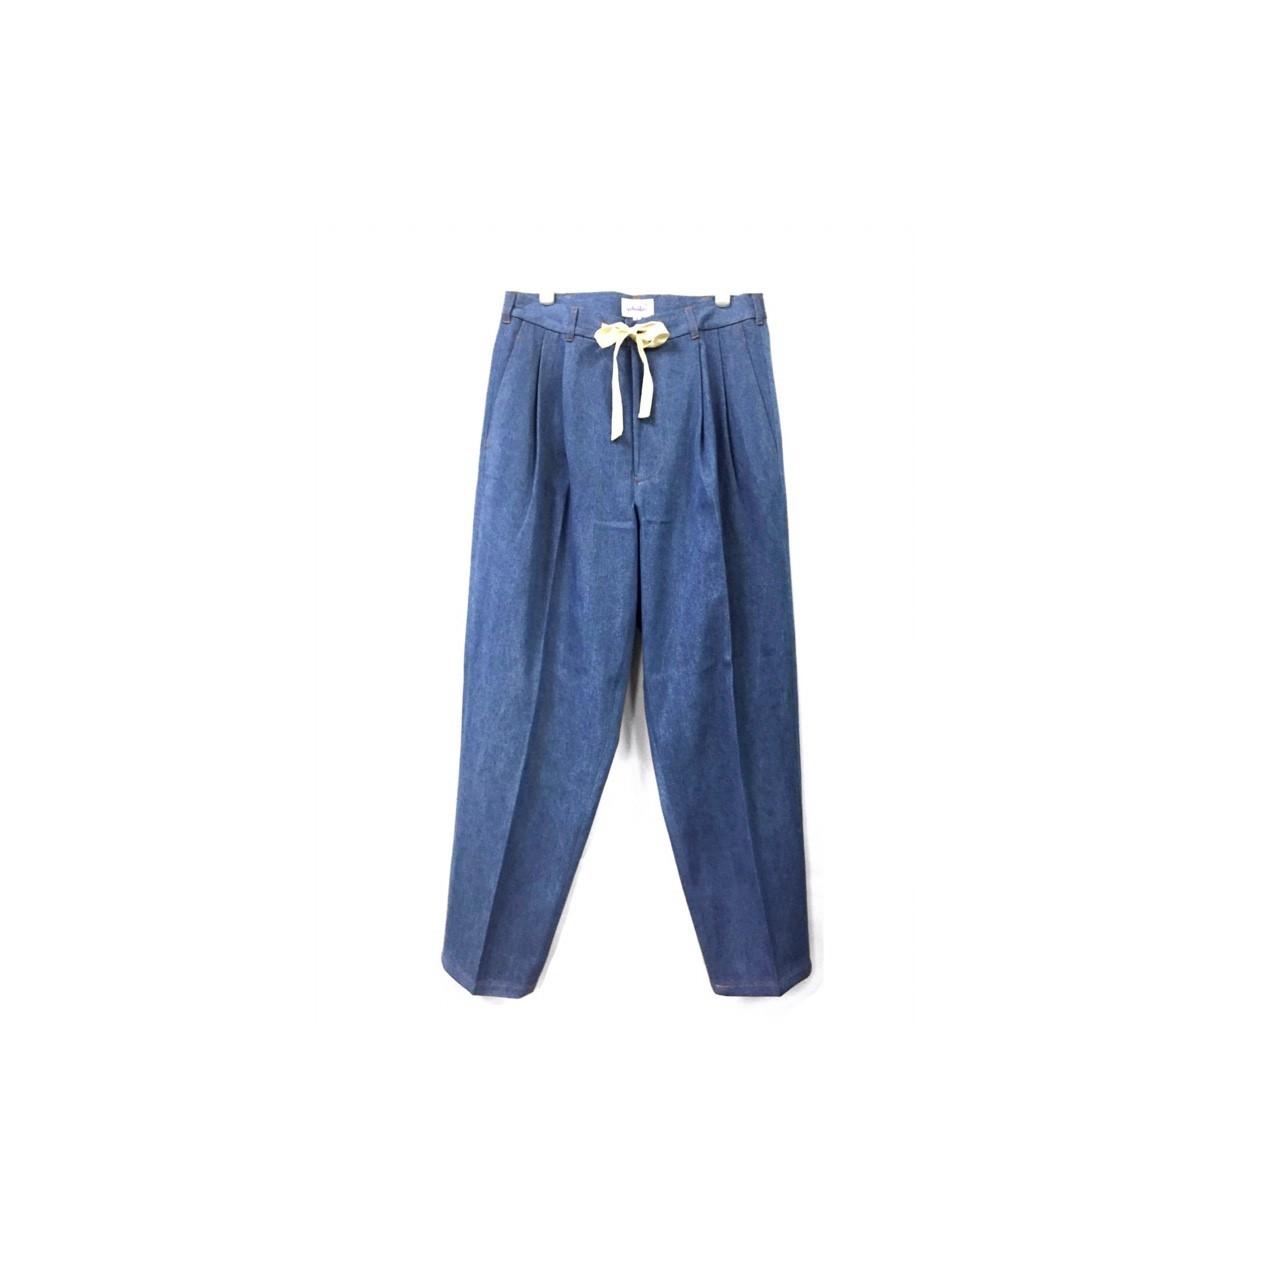 yotsuba - Denim Wide Pants / Wash ¥23000+tax